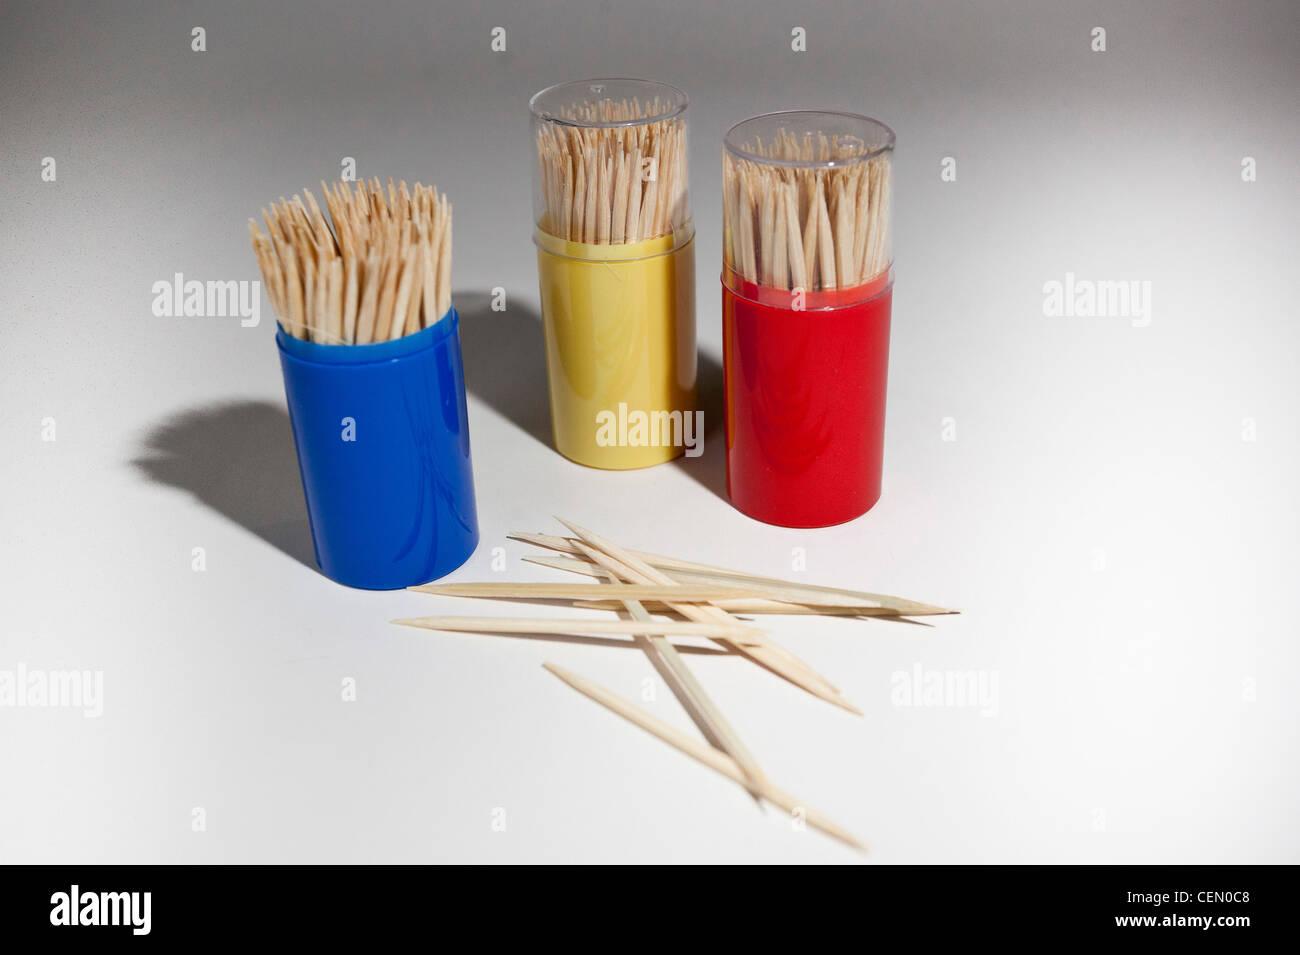 Wooden toothpicks - Stock Image